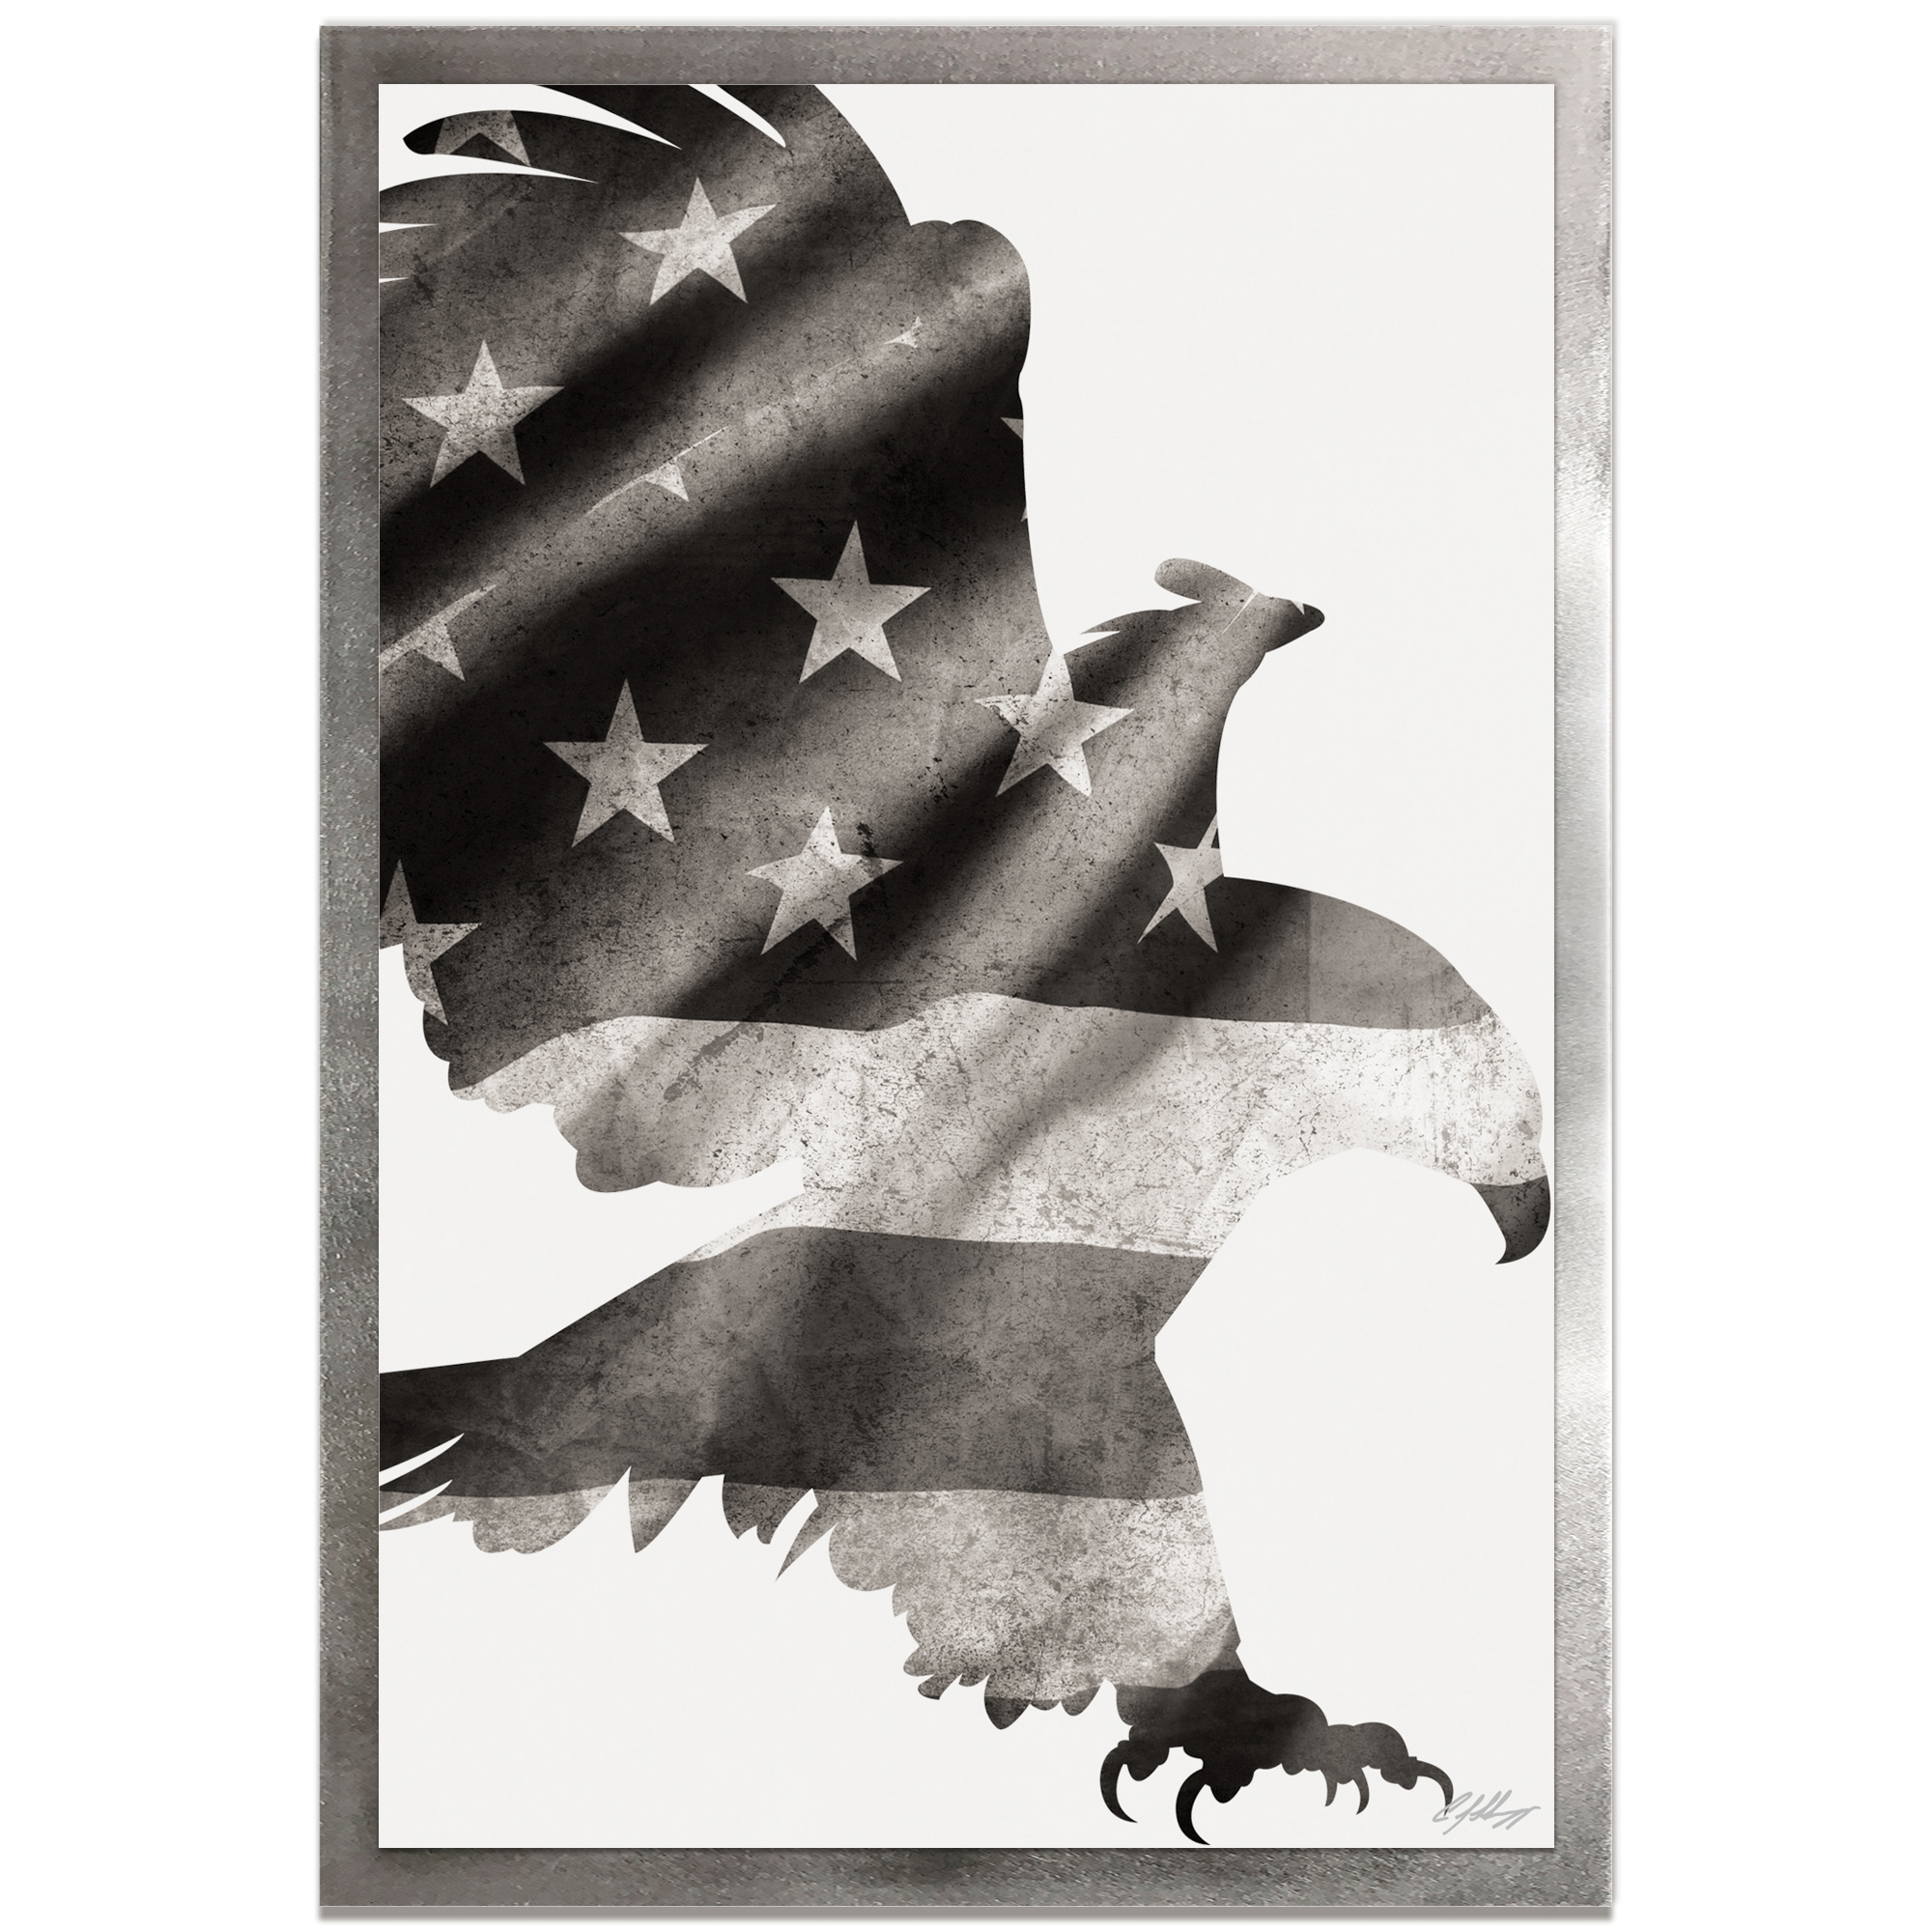 Adam Schwoeppe 'Patriot Eagle Black & White Framed' 22in x 32in Patriotic US Flag Art on Colored Metal